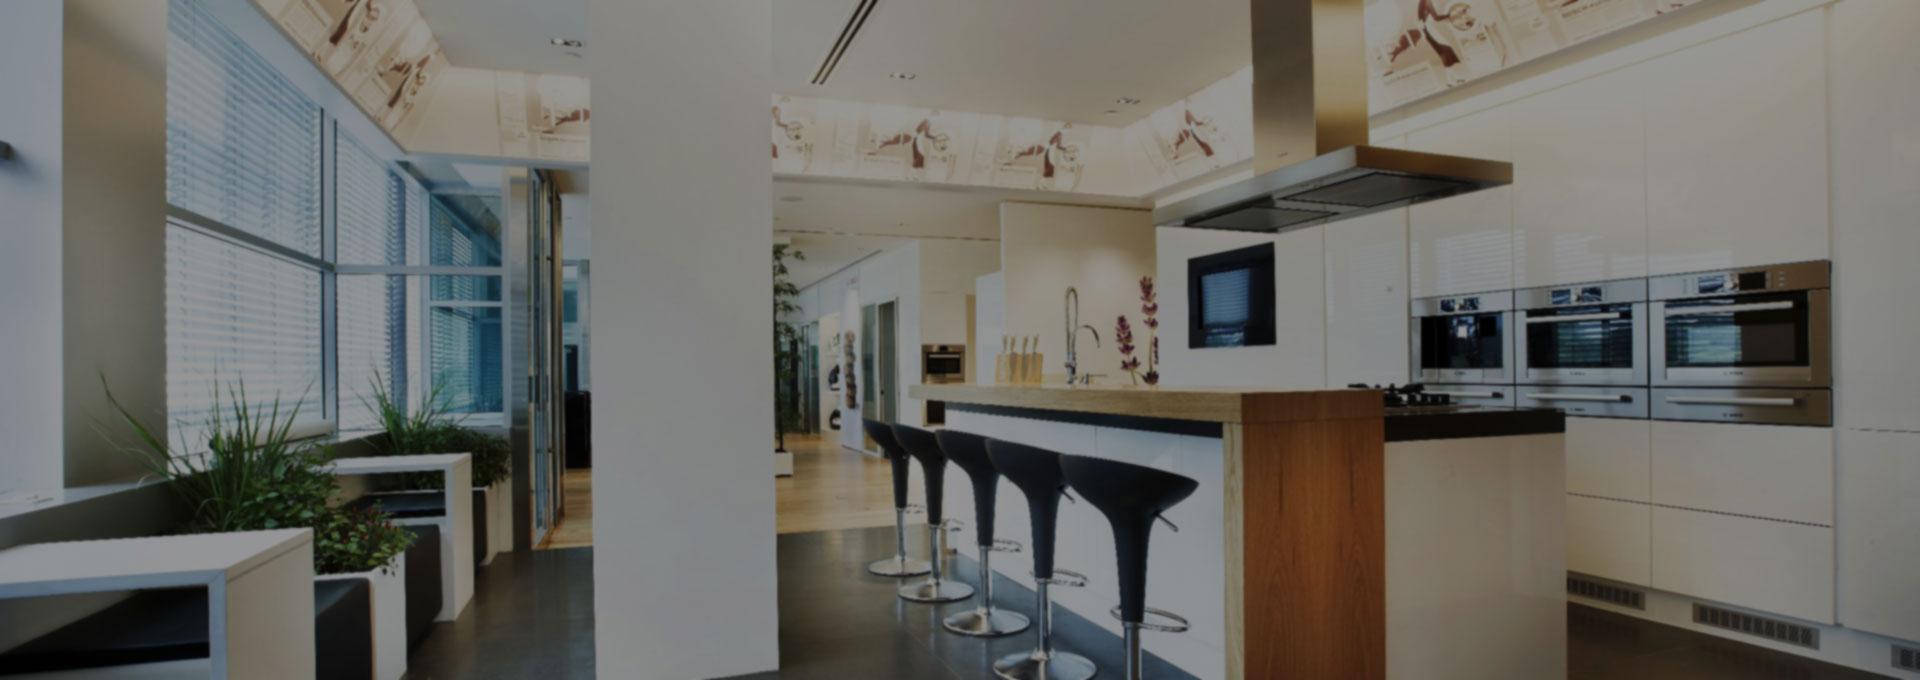 Awesome Bosch Kitchen Center Sandy Utah Festooning - Home Design ...